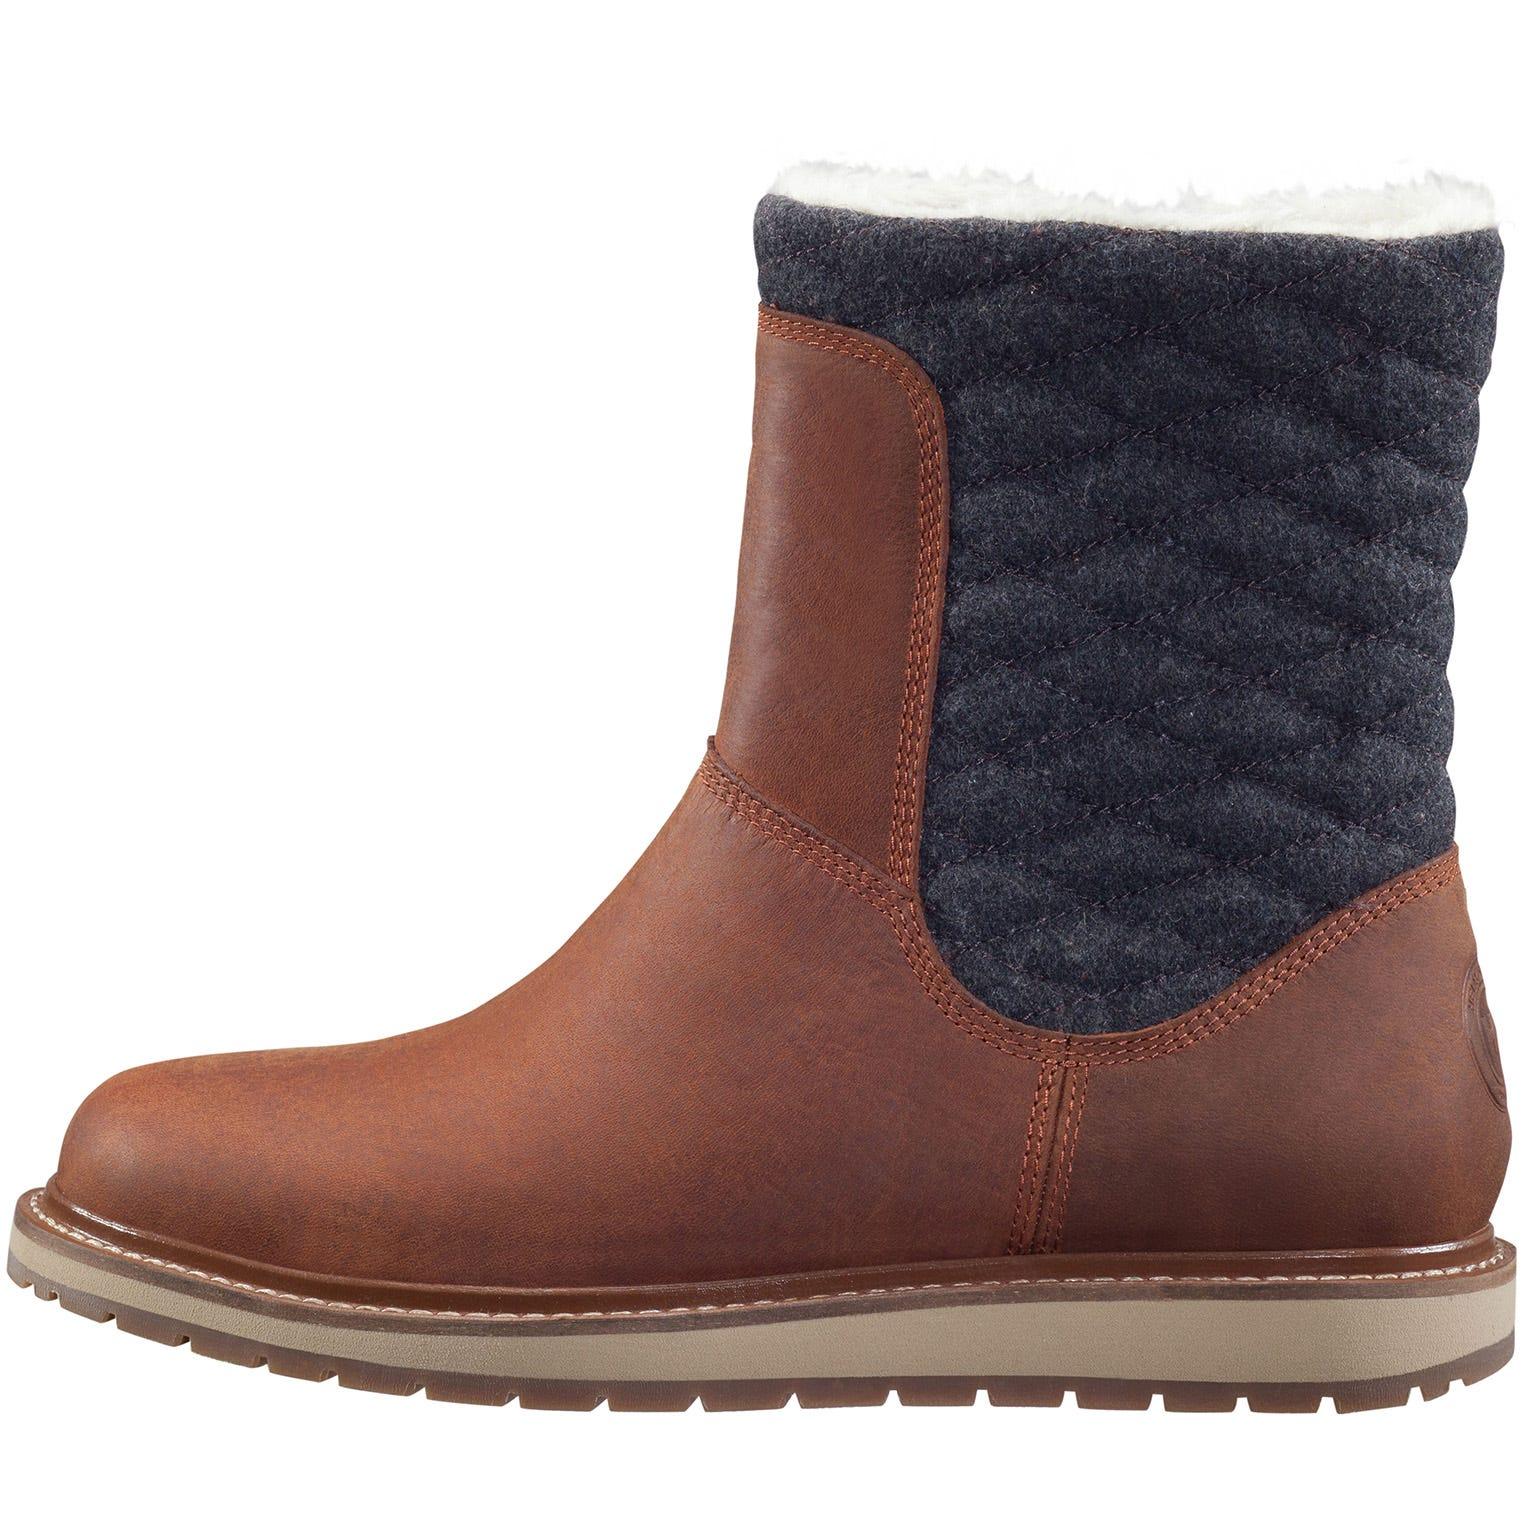 Helly Hansen W Seraphina Womens Winter Boot Brown 40/8.5